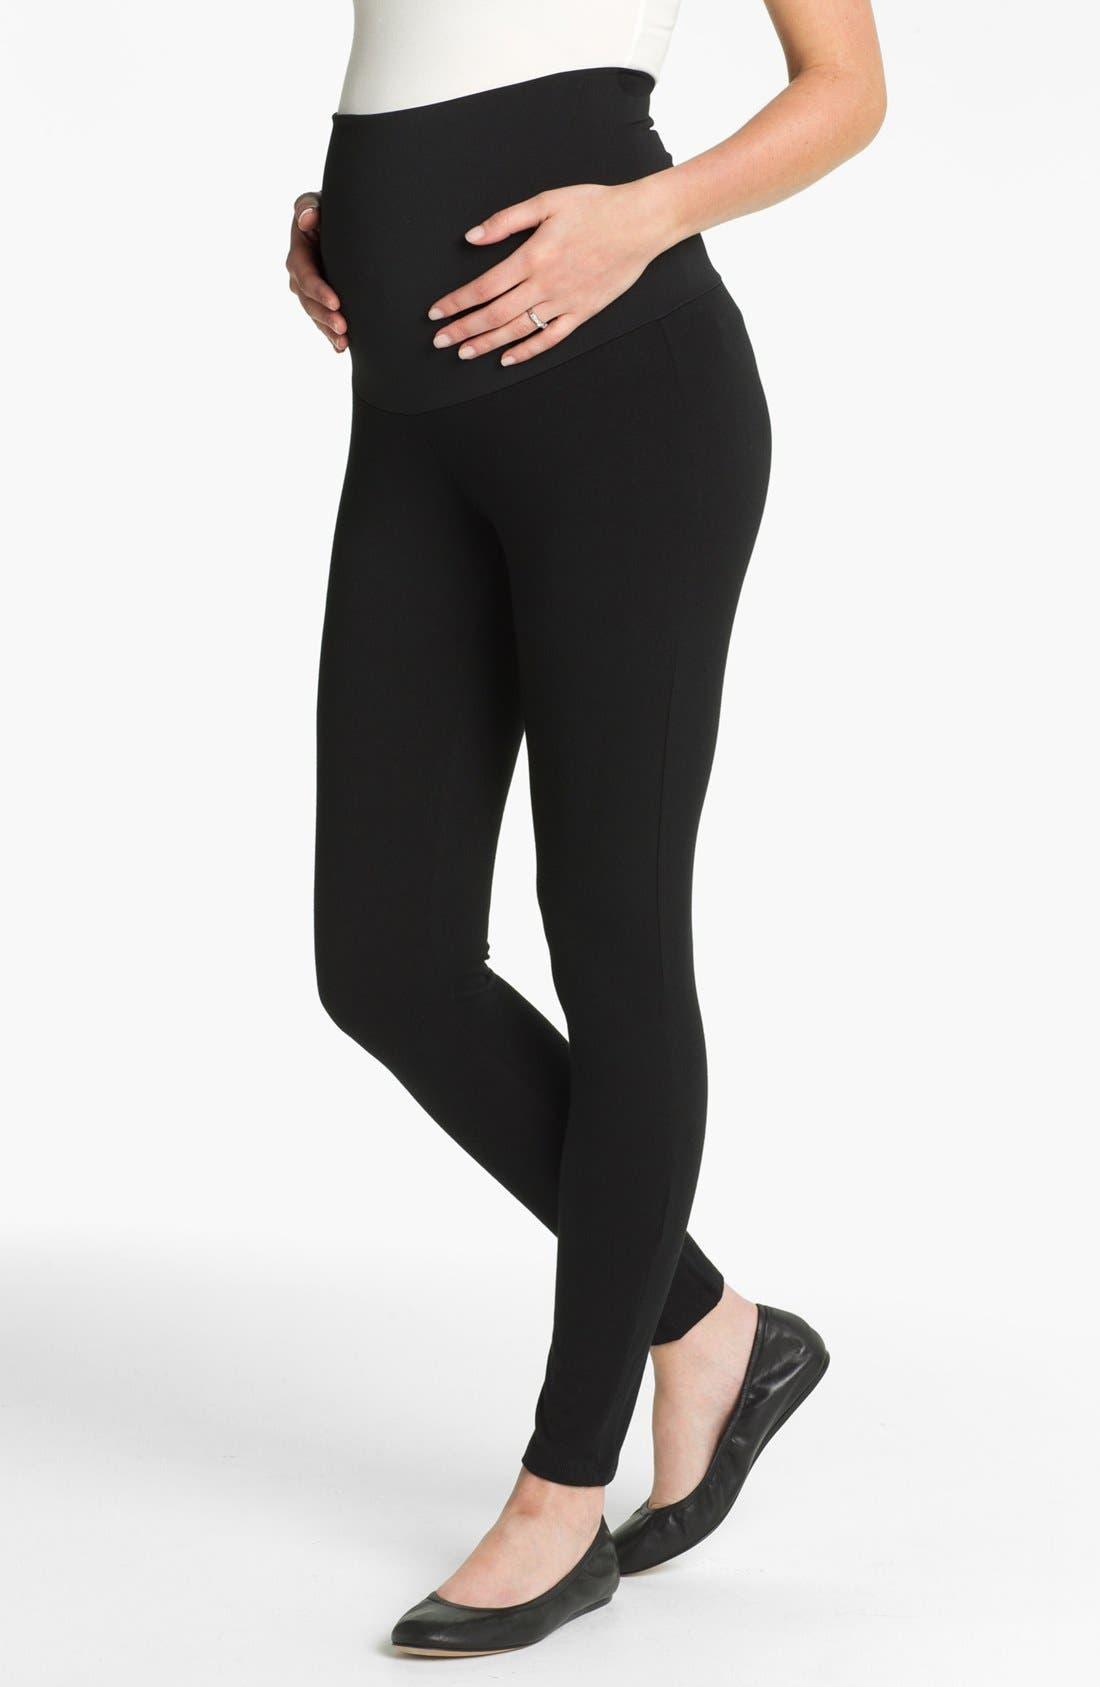 MATERNAL AMERICA Belly Support Maternity Leggings, Main, color, 001